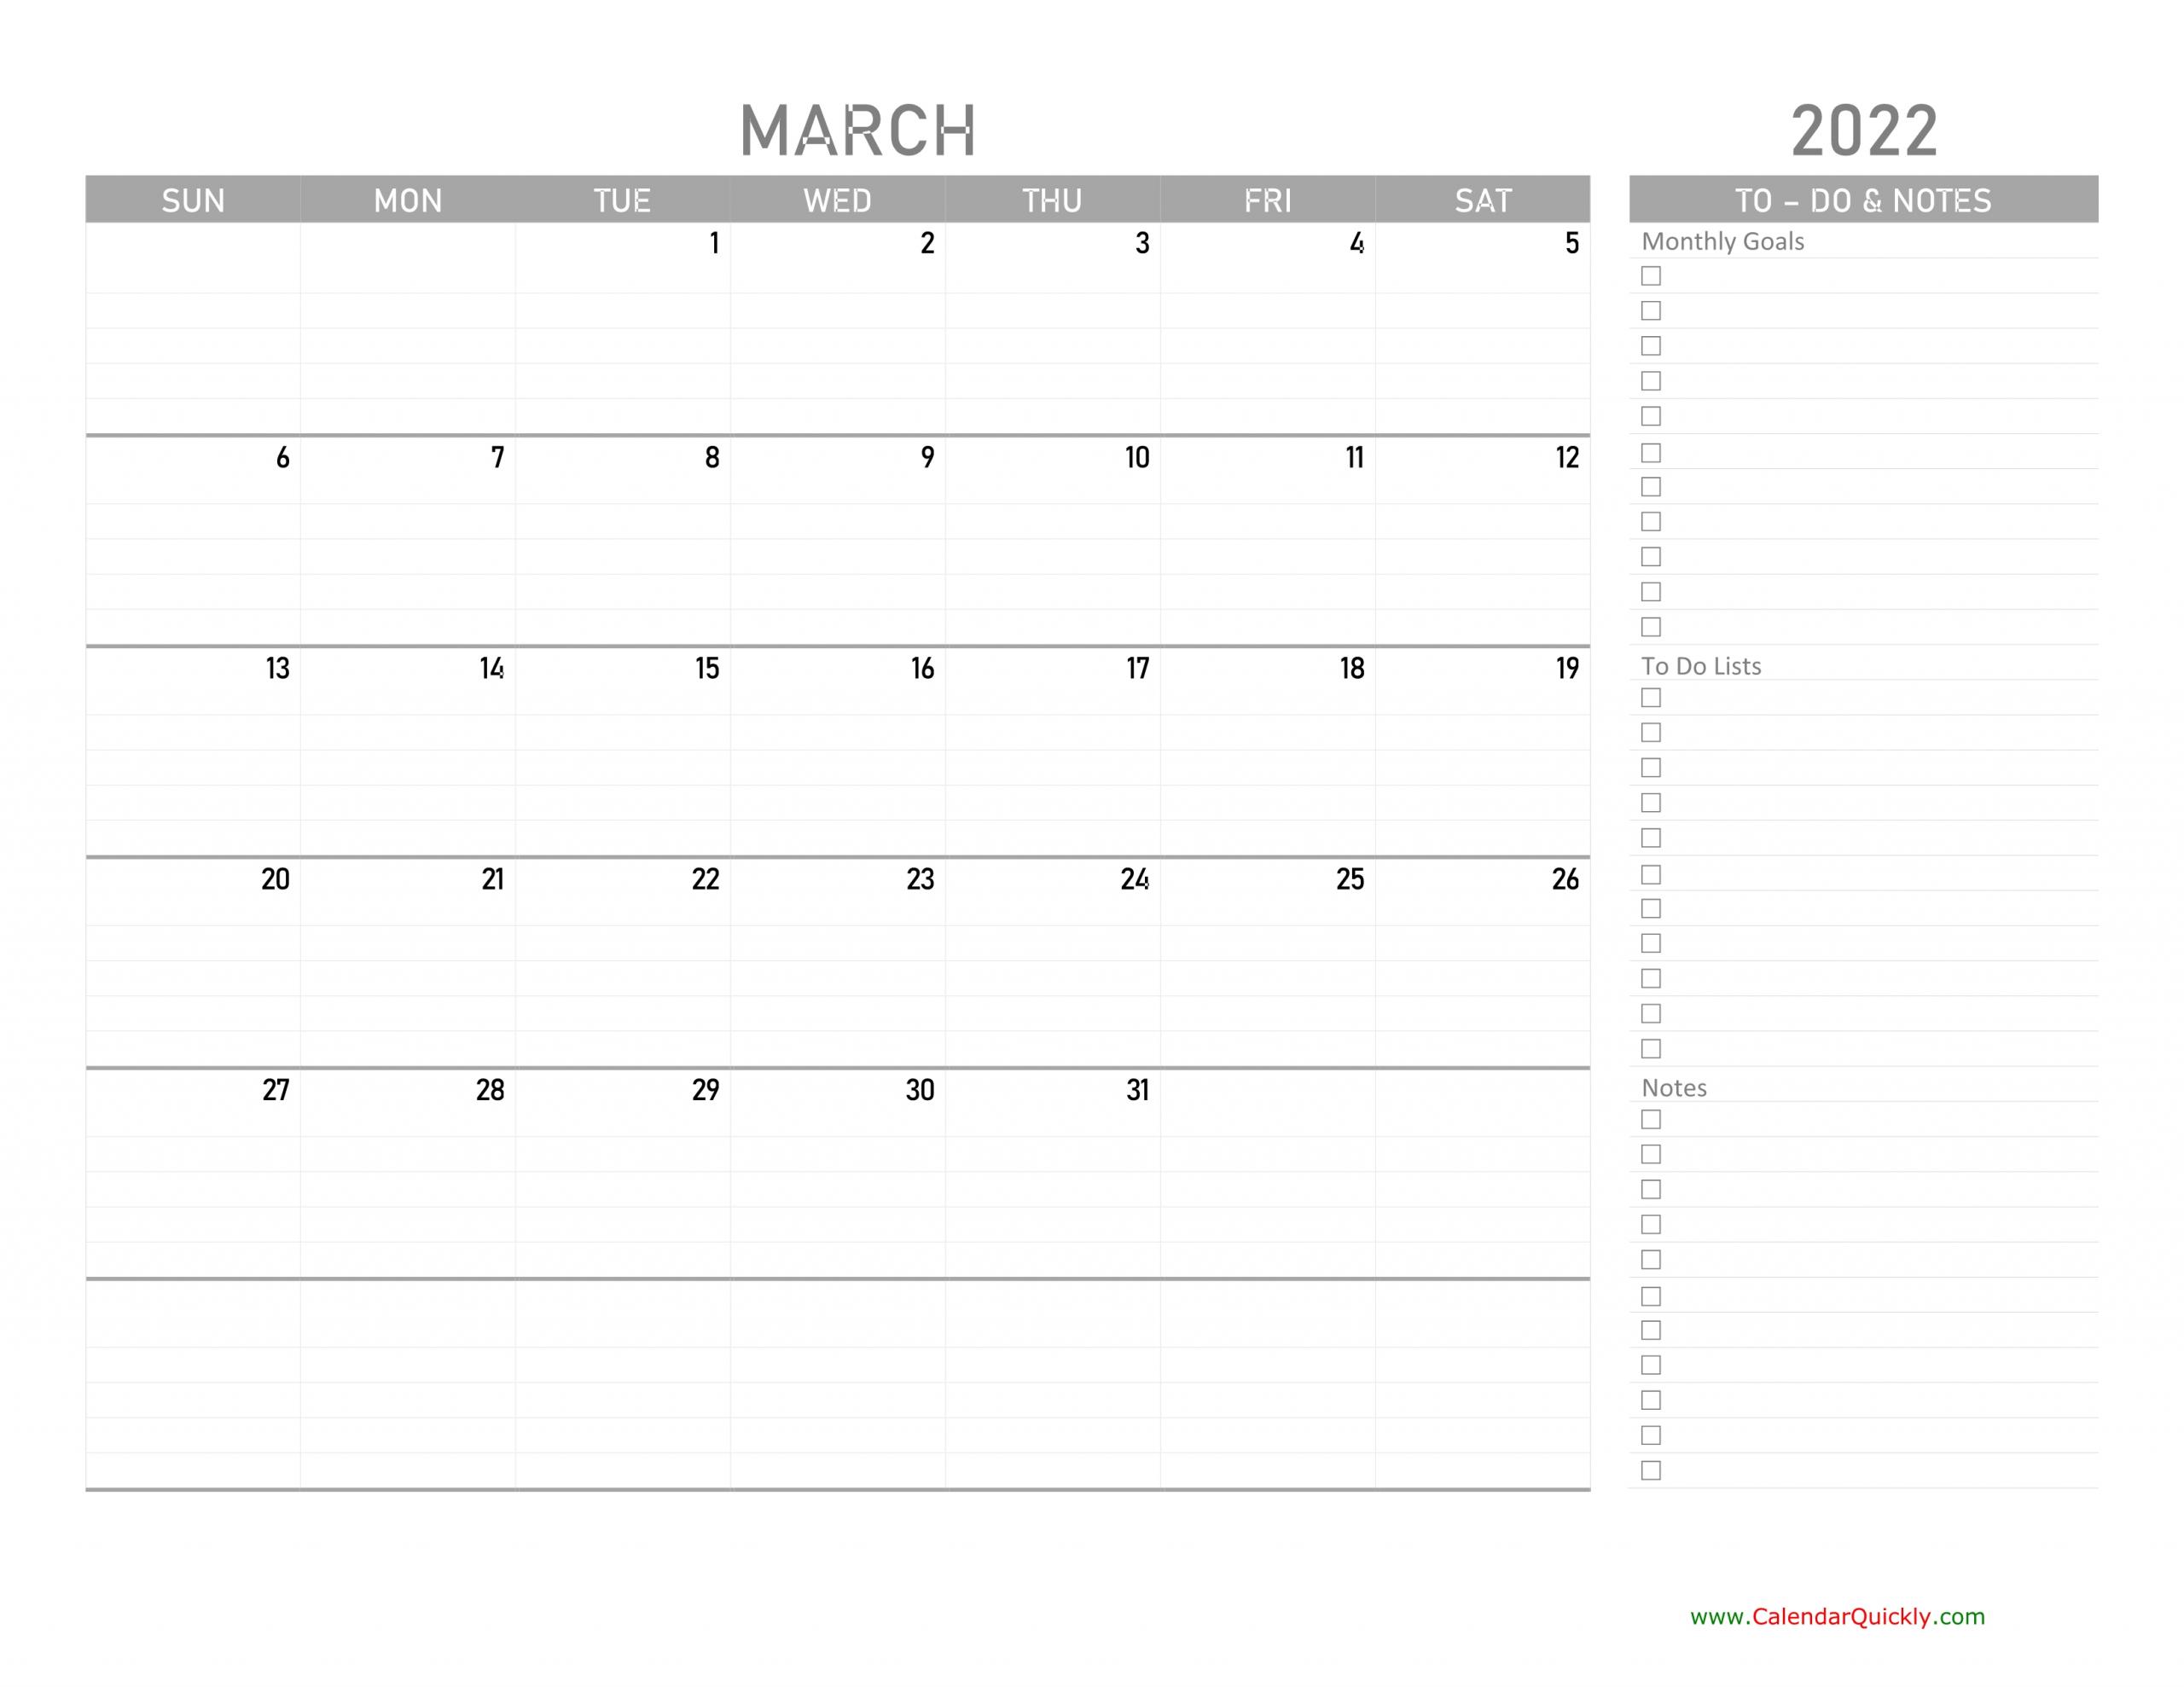 March 2022 Calendar With To-Do List | Calendar Quickly